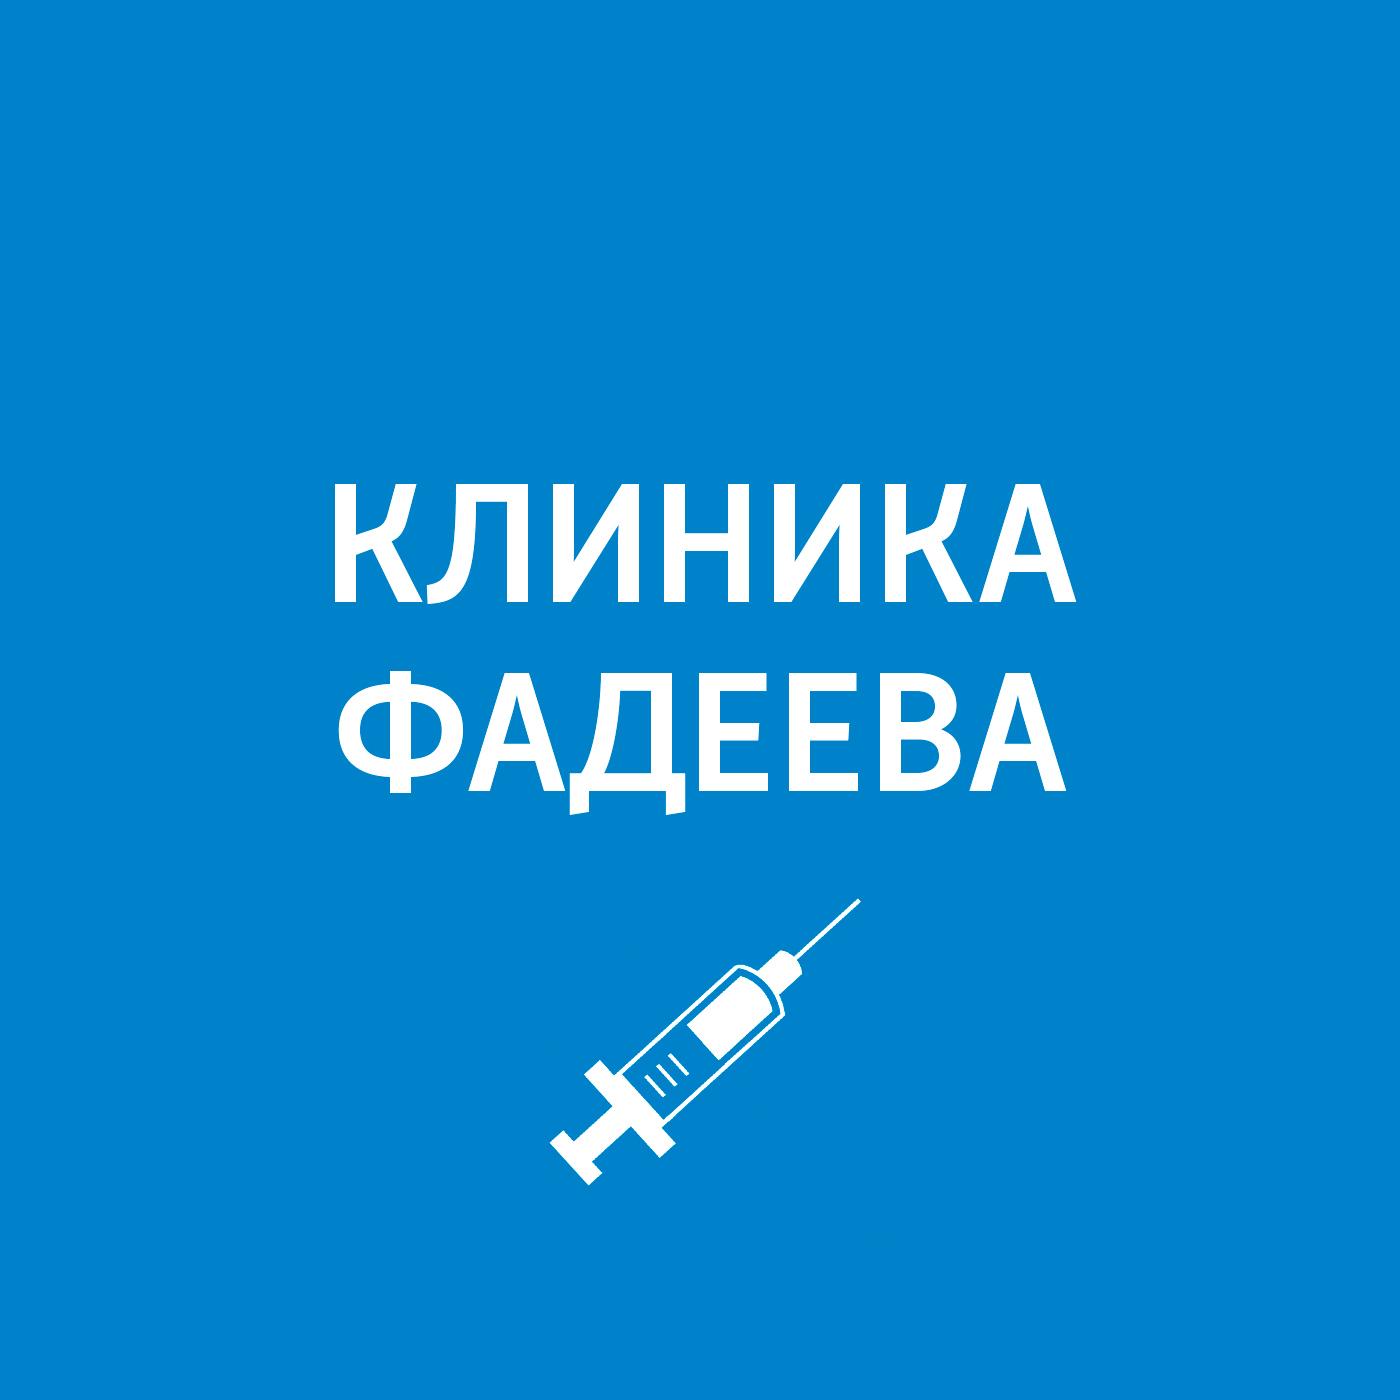 Пётр Фадеев Врач-педиатр цена 2017